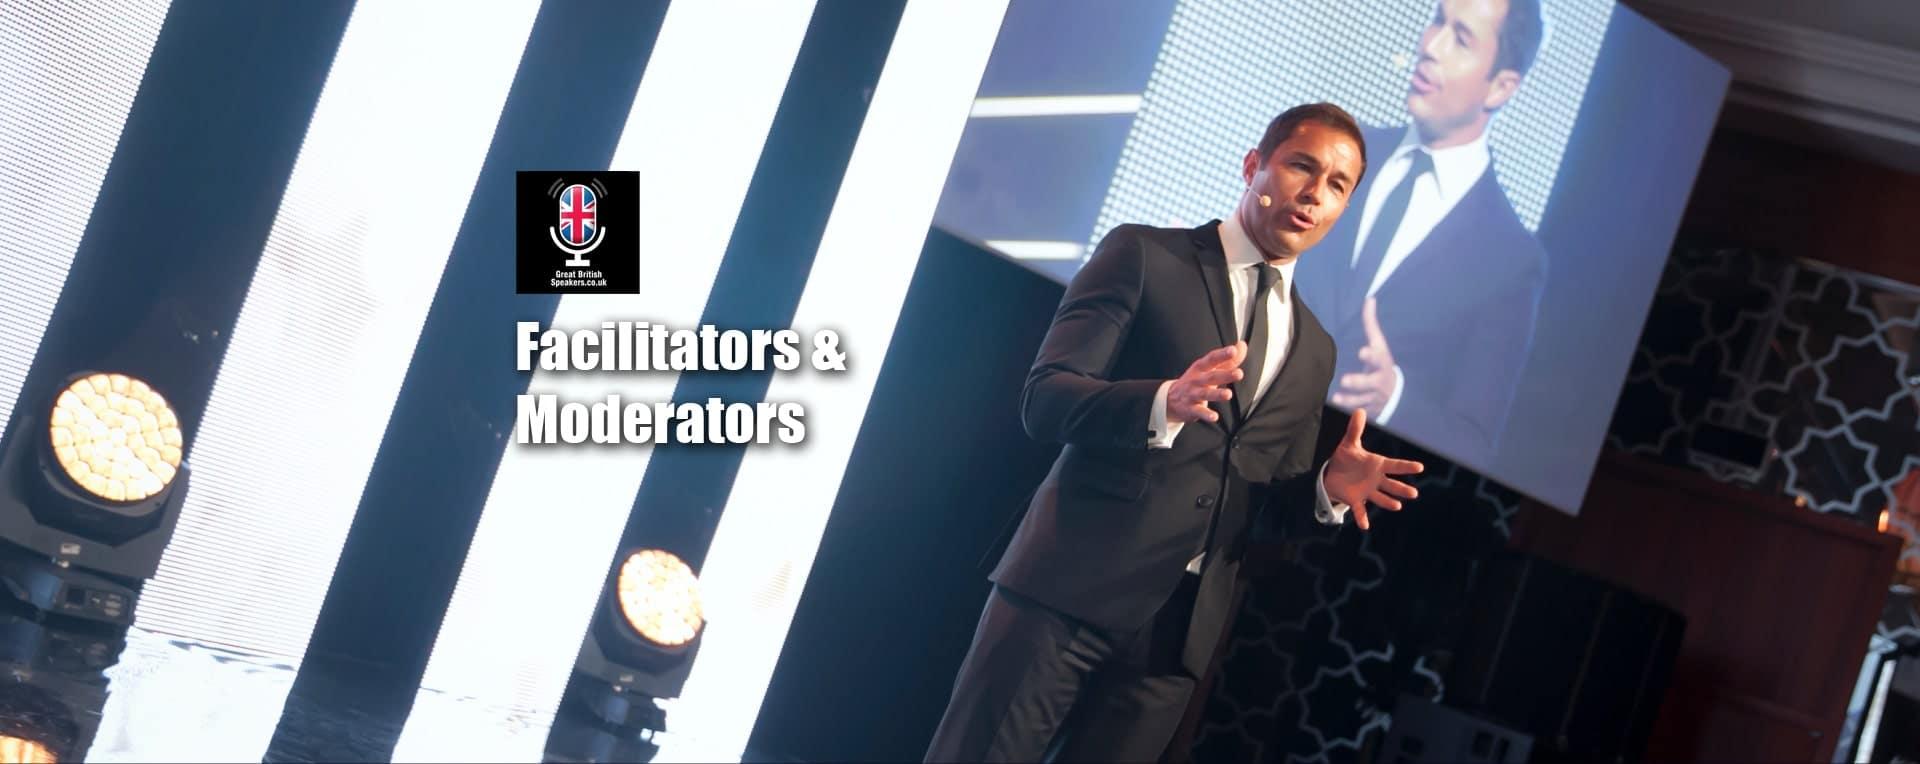 Facilitators & Moderators Slider Great British Speakers-min